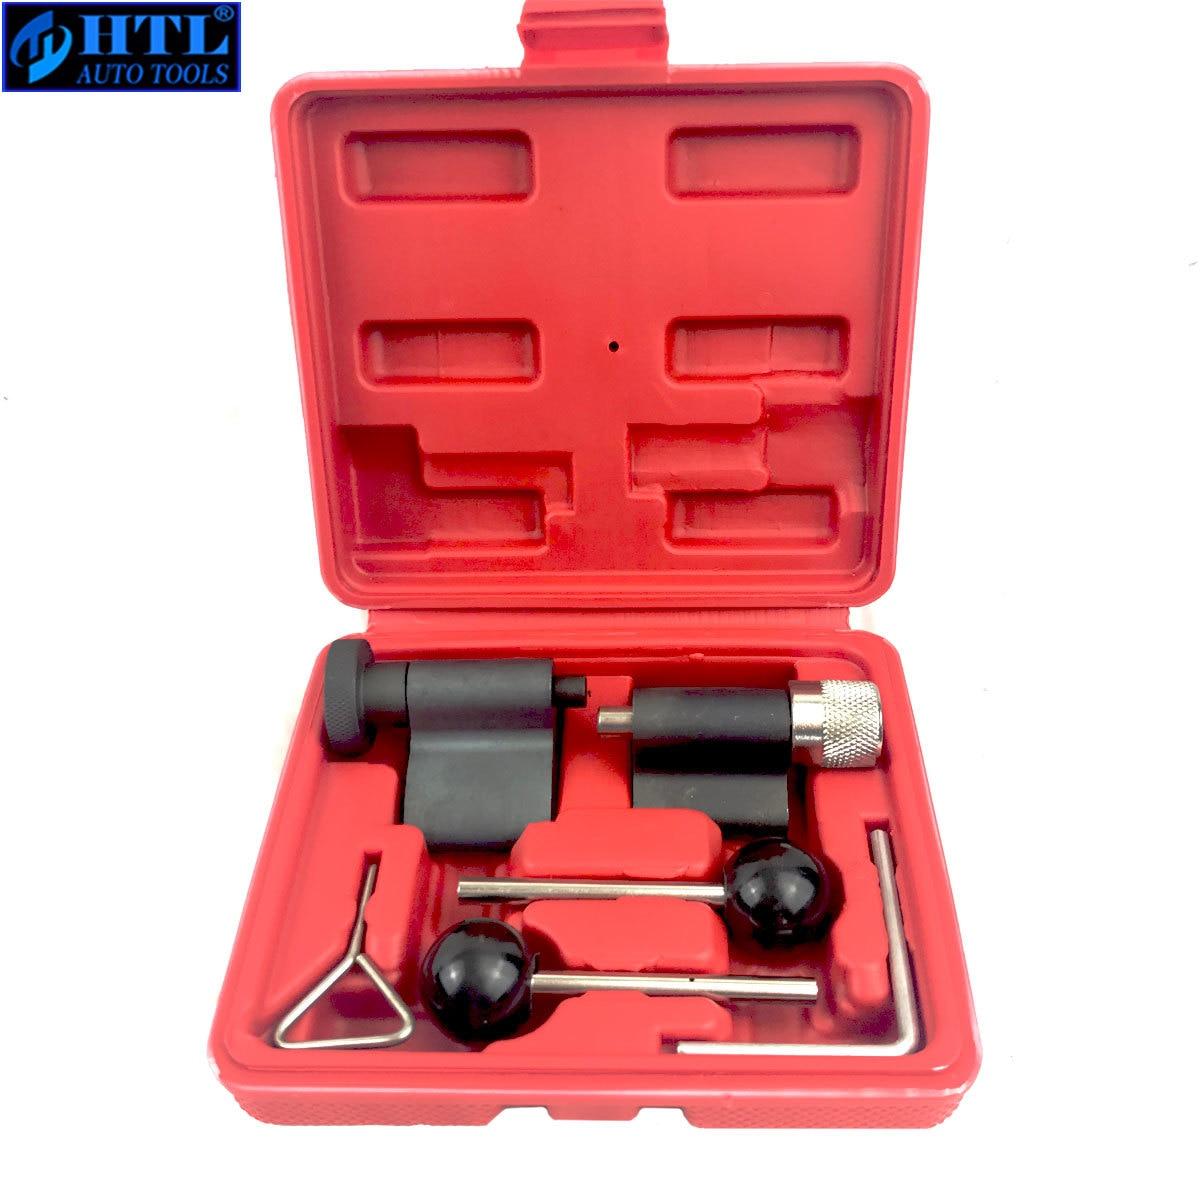 6 pc universal motor diesel sincronismo cam crank locking tool set para vw audi t10050 t10100